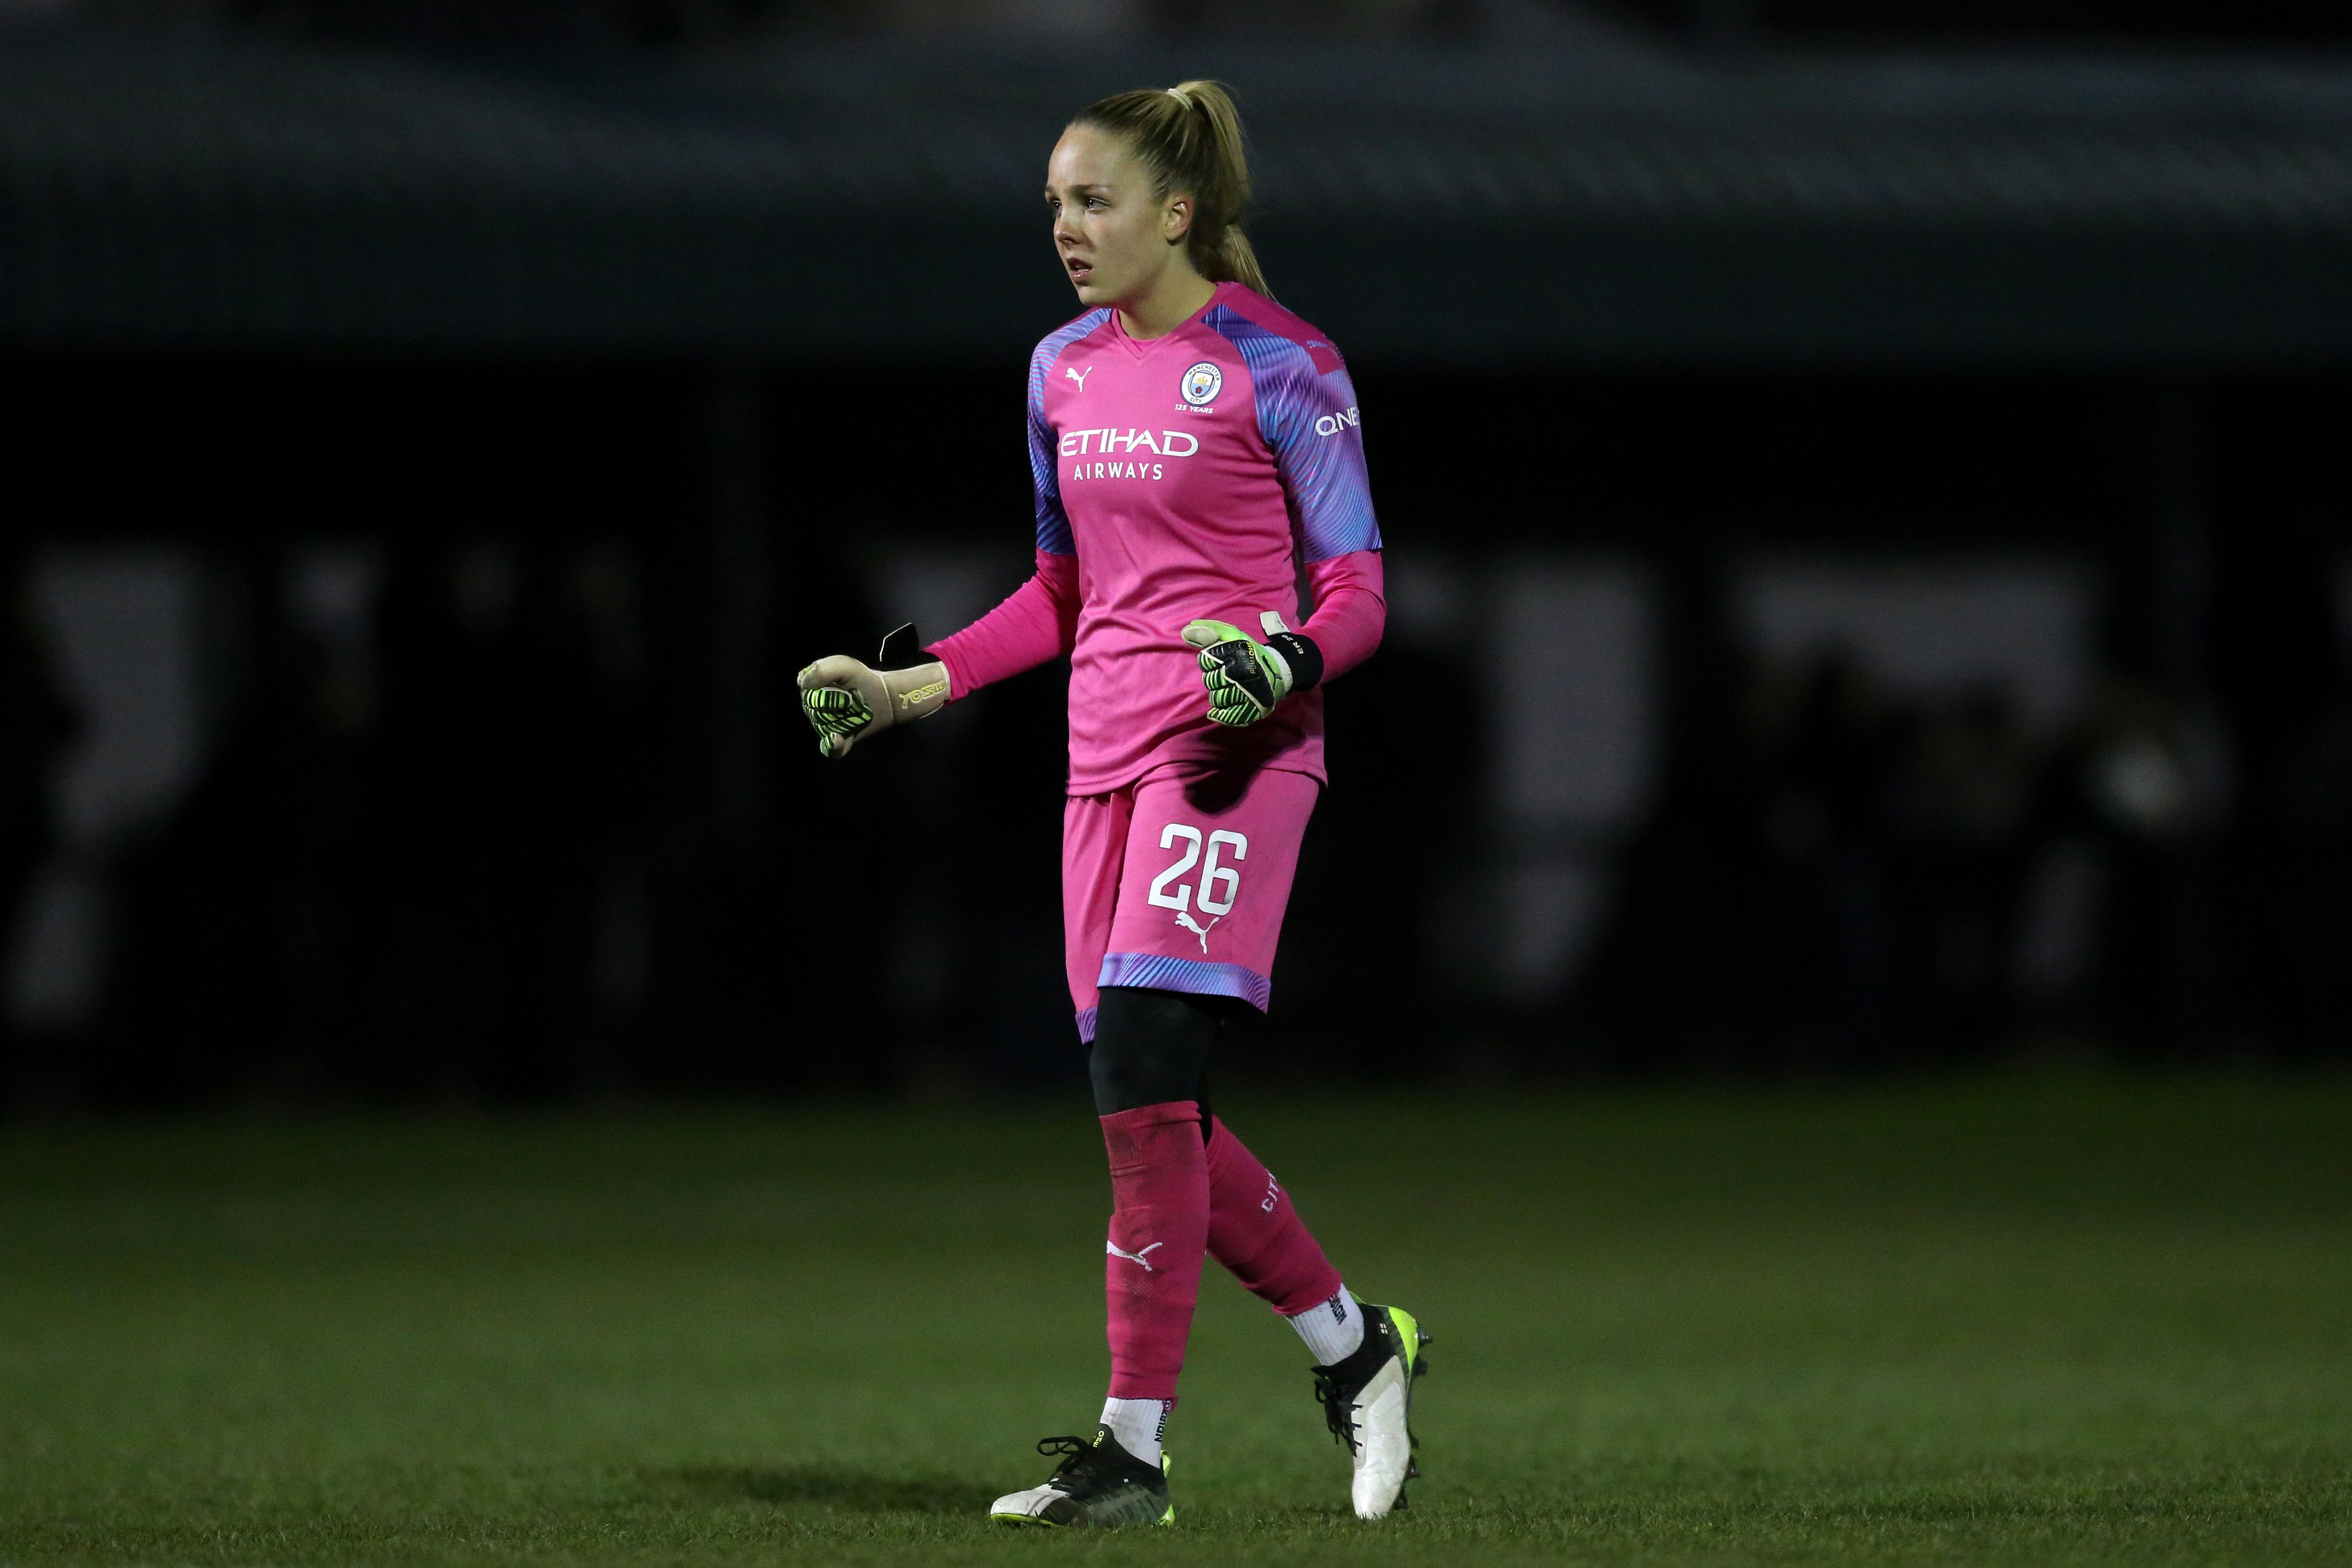 Everton Women v Manchester City Women - FA Women's Continental League Cup